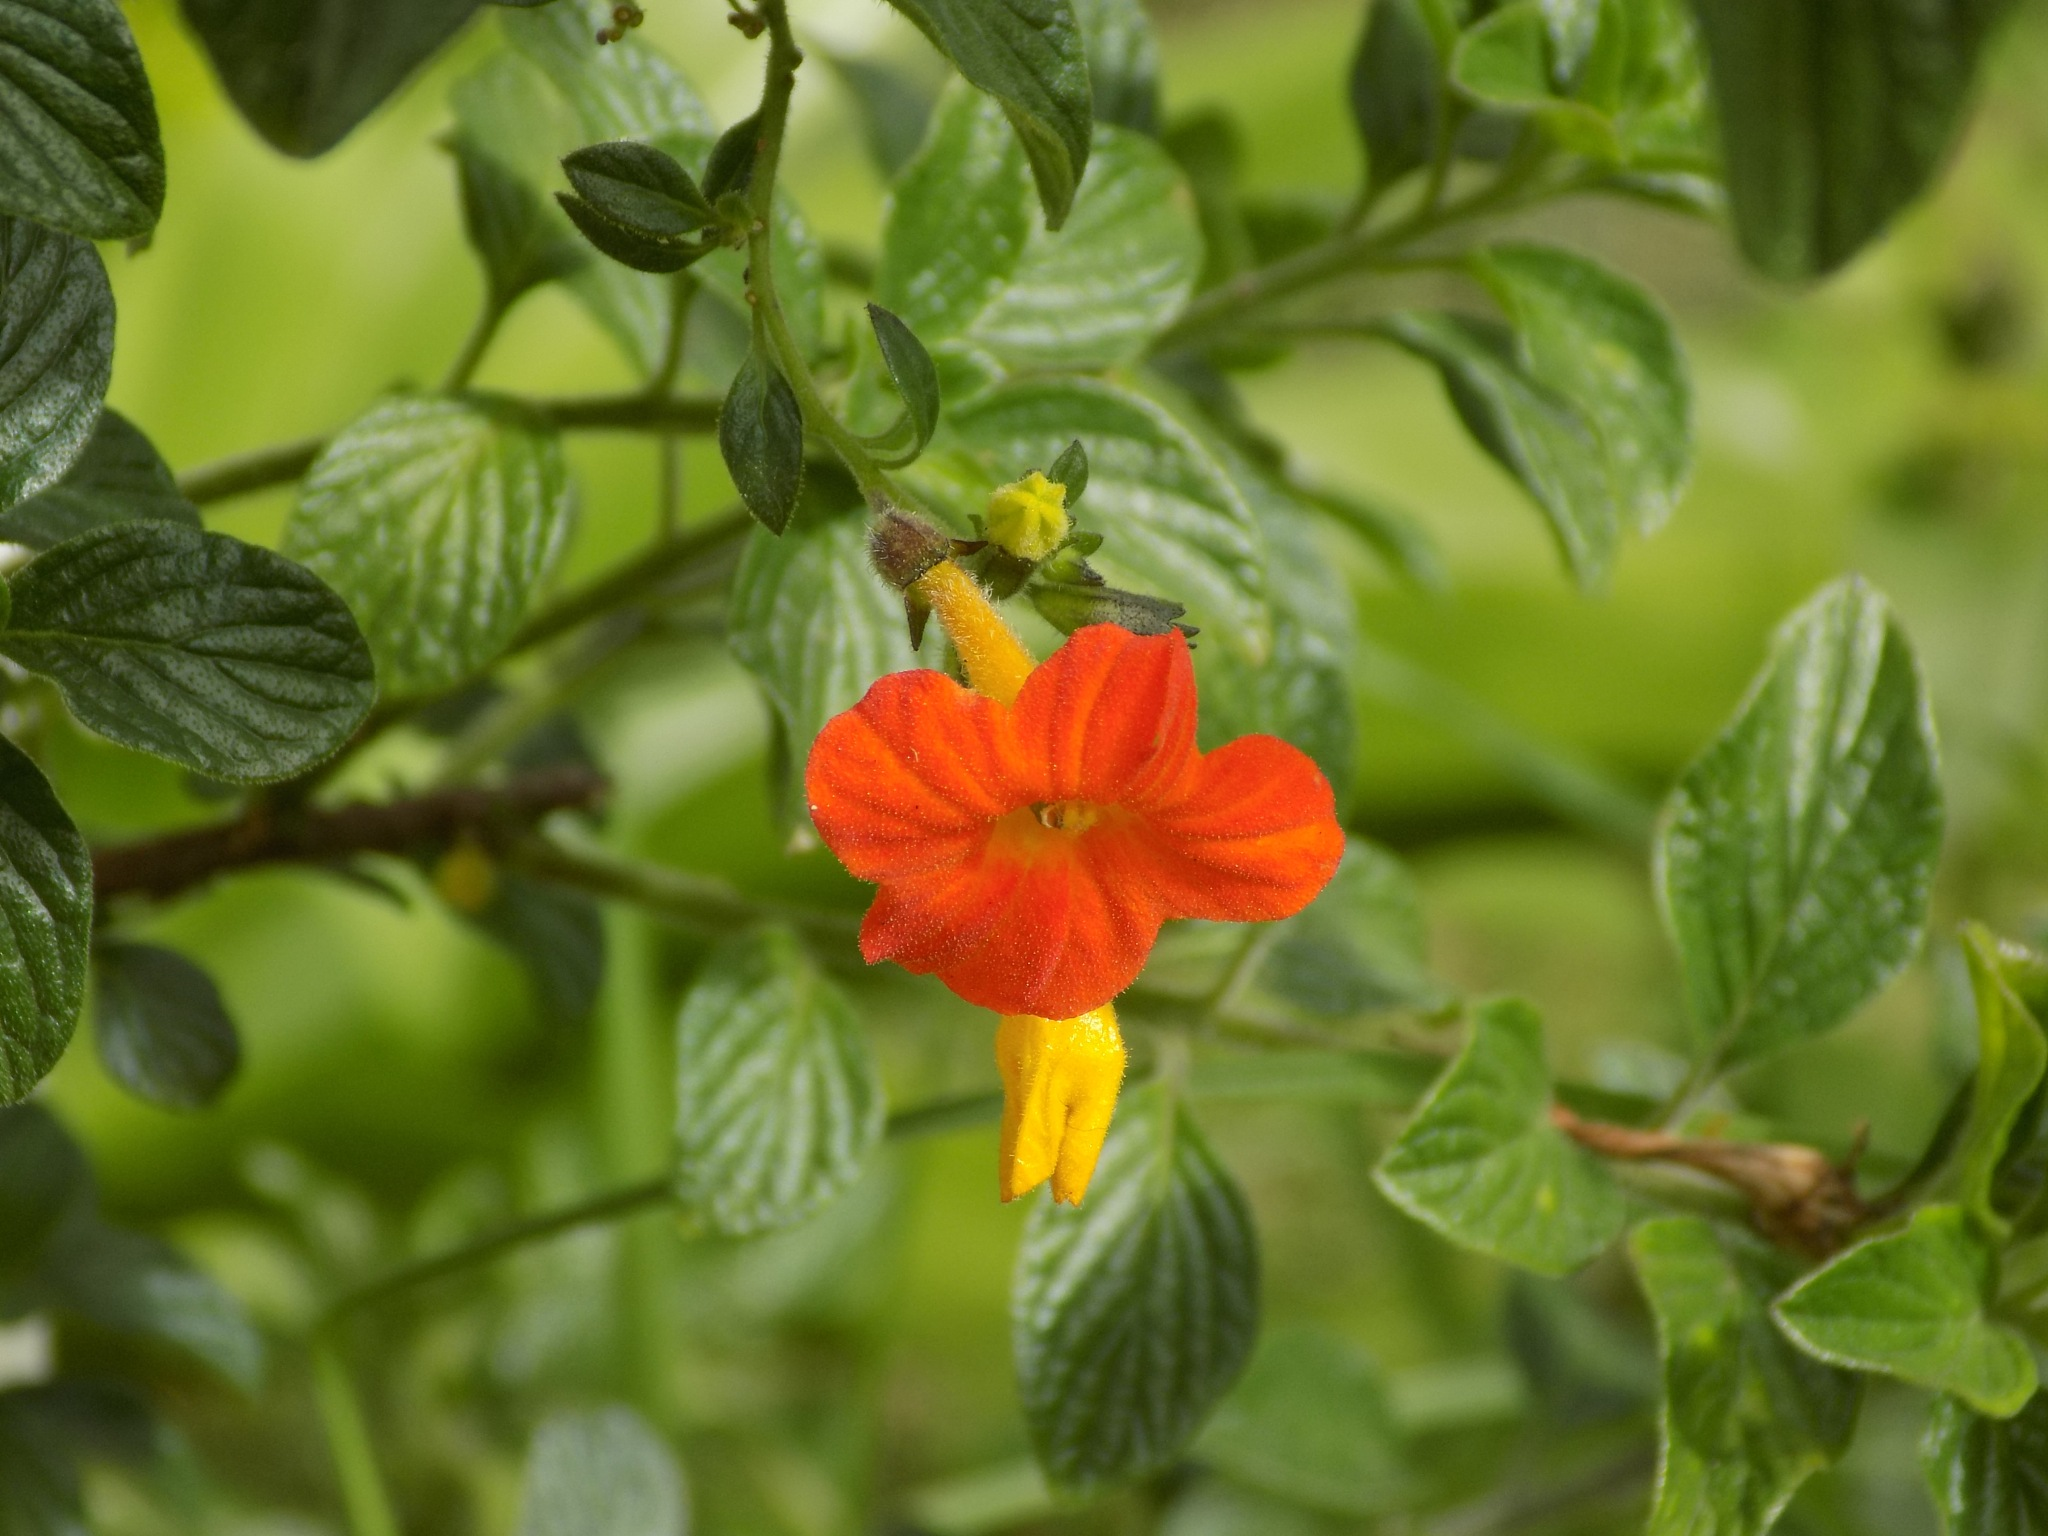 Flower by Chandramoulieswar